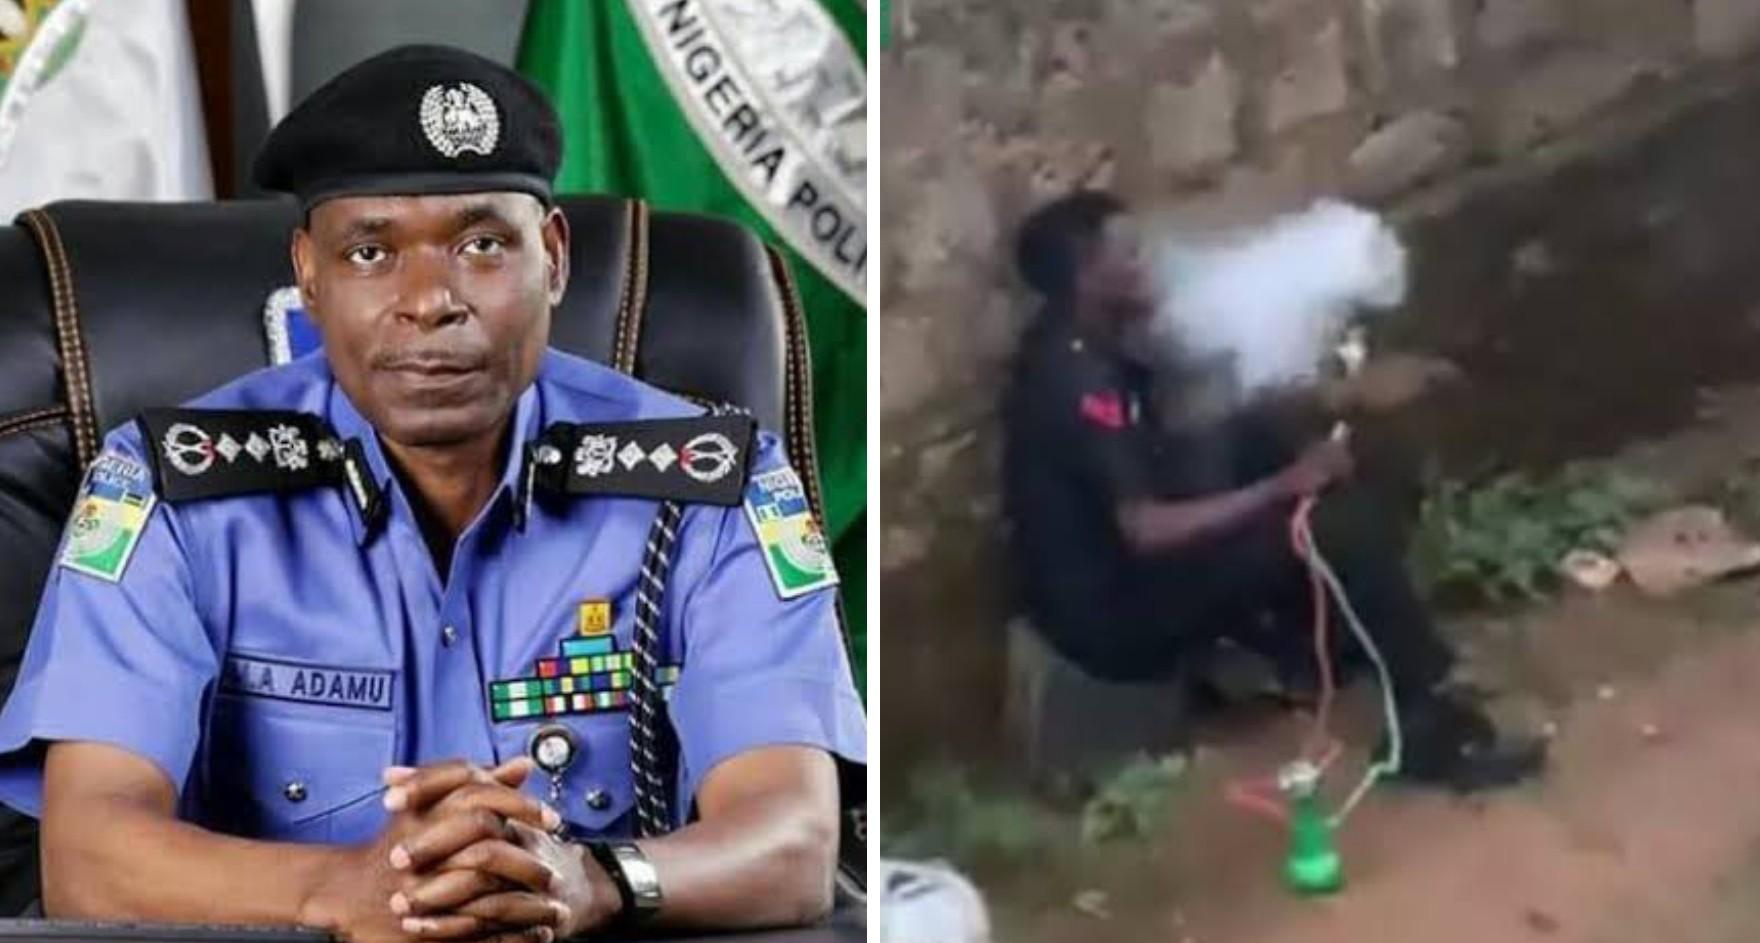 Police investigate video of man in 'police uniform' smoking shisha